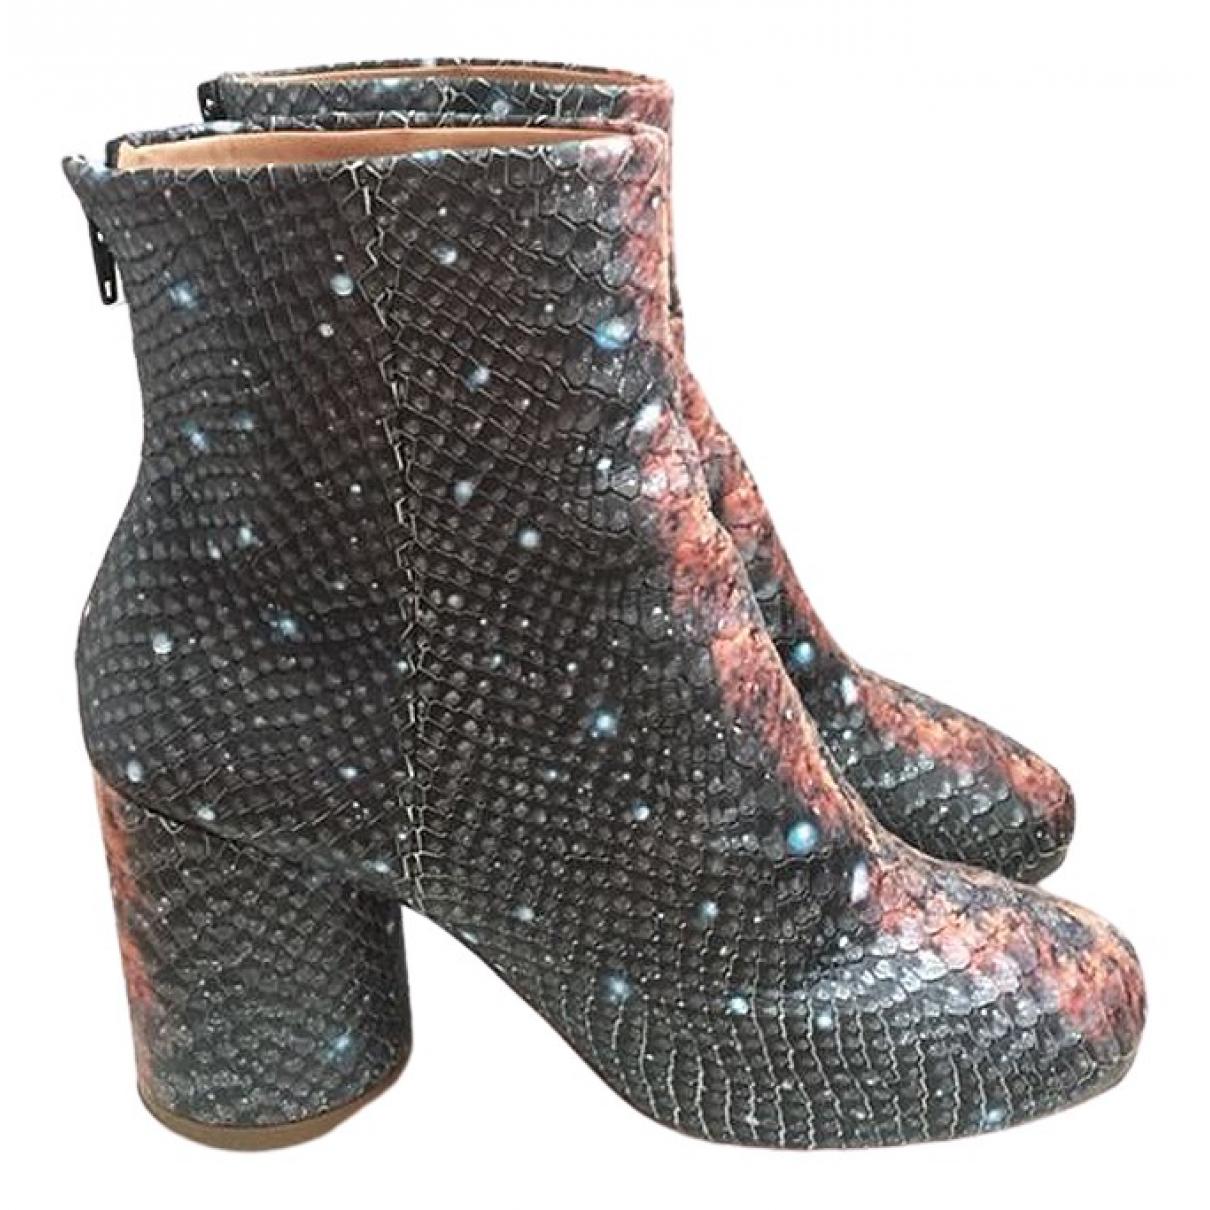 Maison Martin Margiela \N Grey Leather Ankle boots for Women 37.5 EU